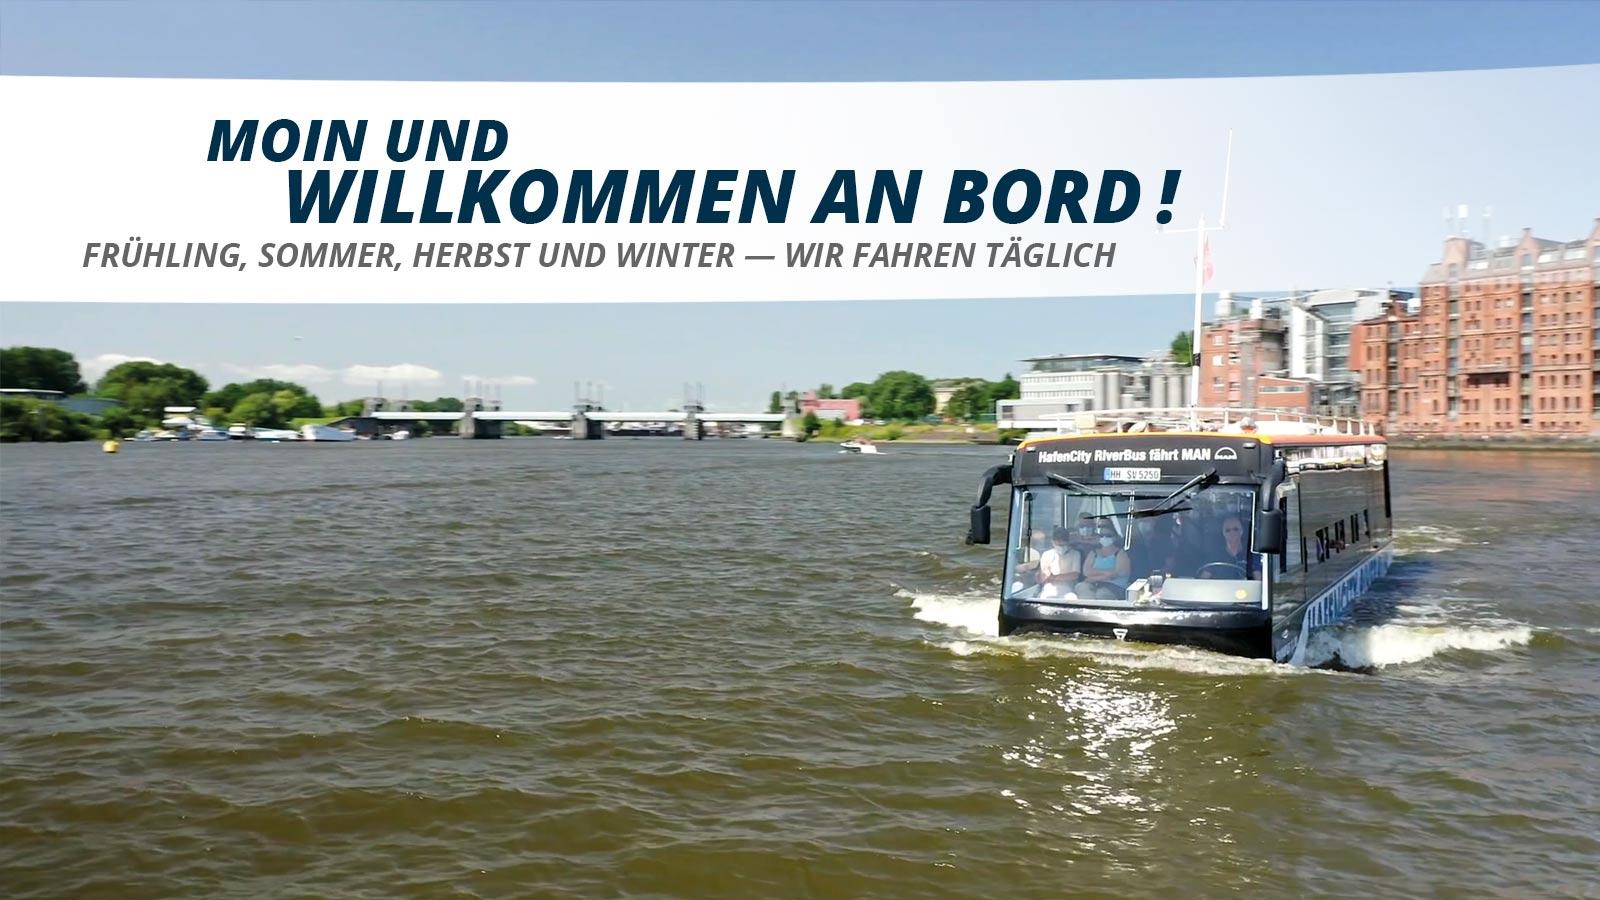 hafencity riverbus die stadtkreuzfahrt. Black Bedroom Furniture Sets. Home Design Ideas